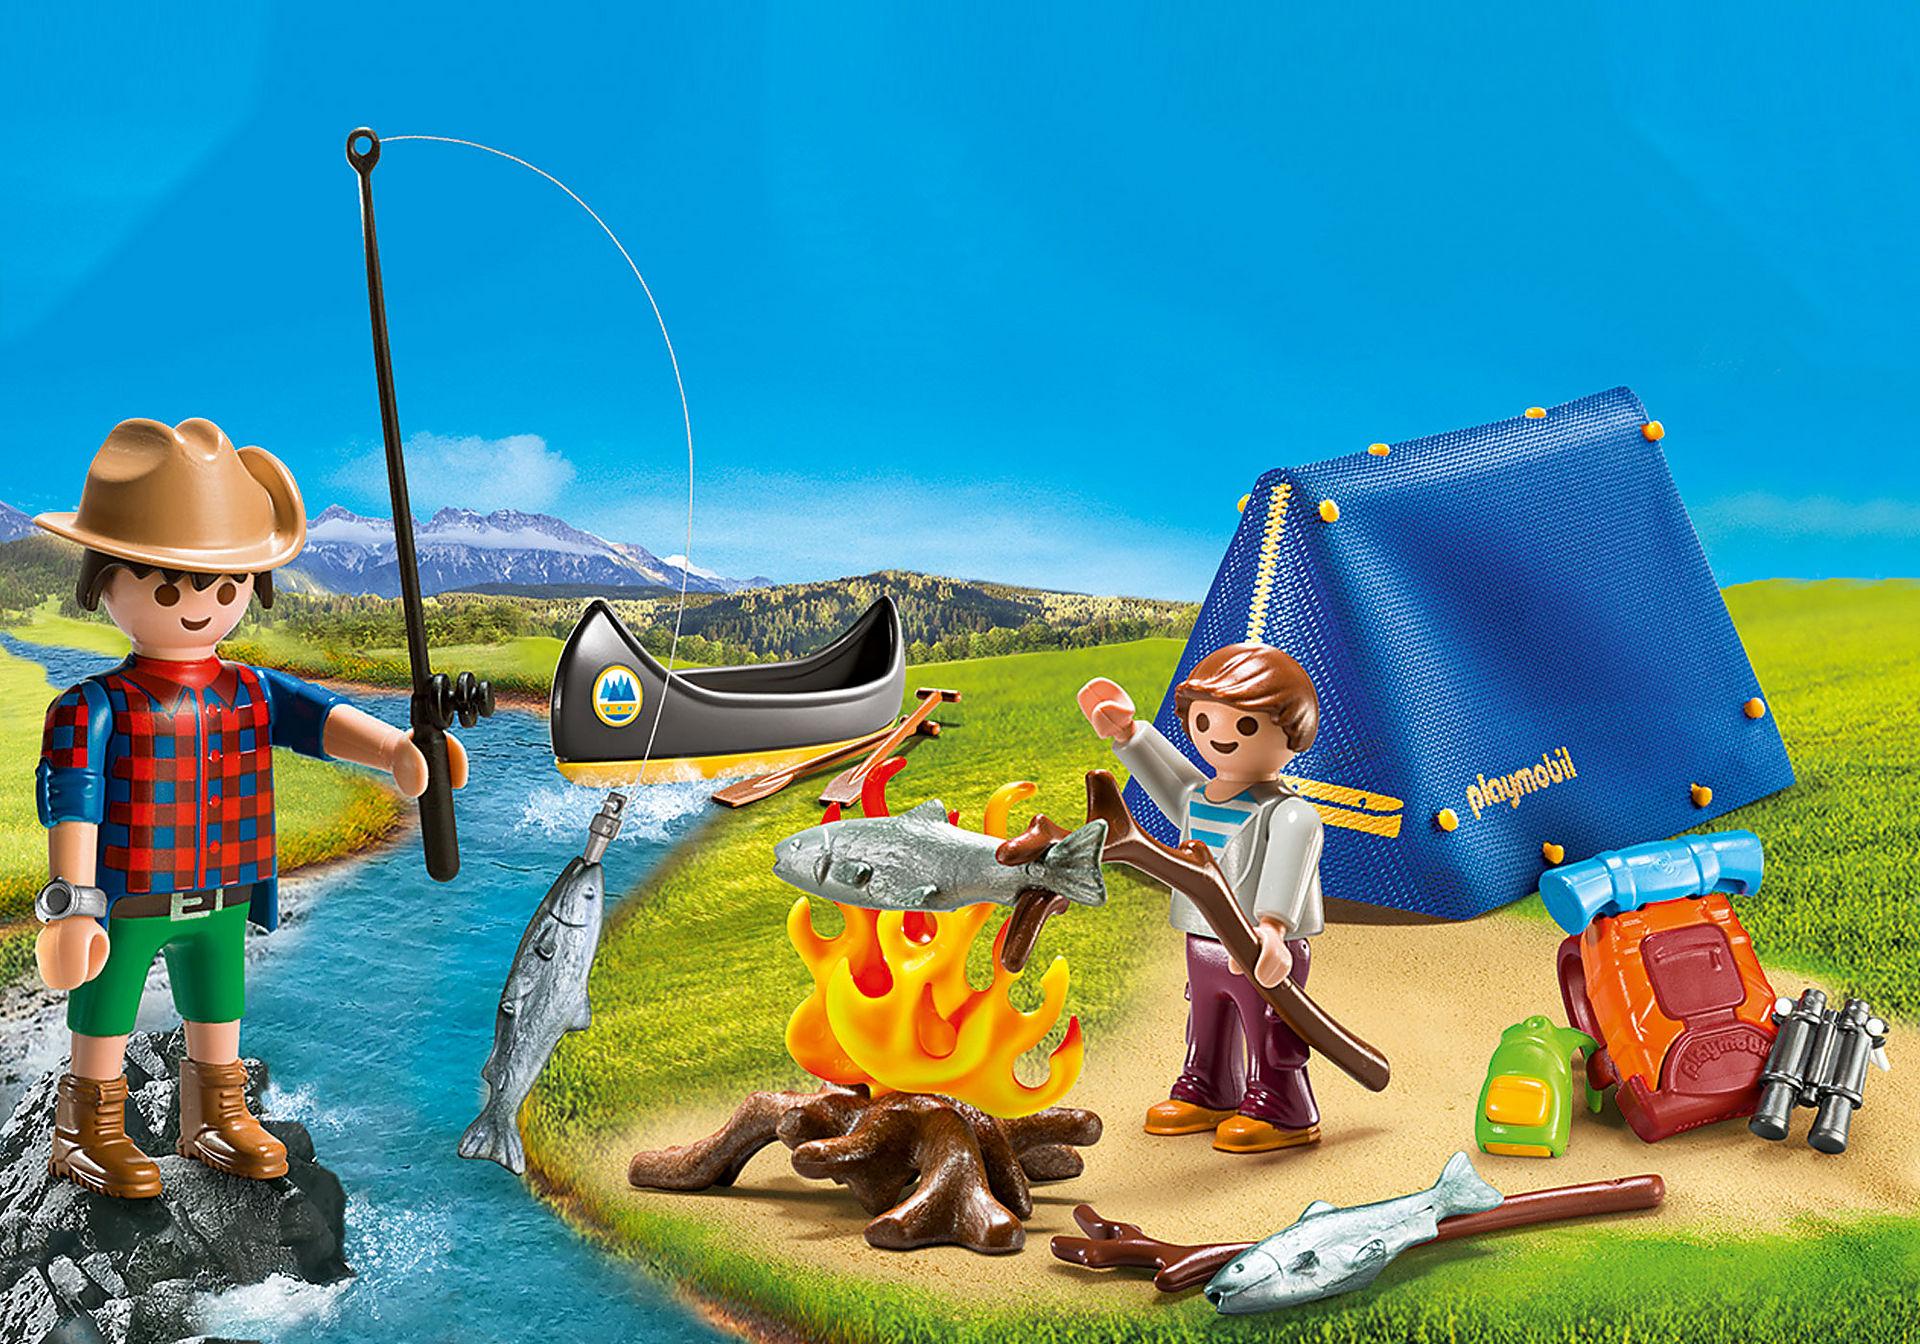 http://media.playmobil.com/i/playmobil/9323_product_detail/Camping Adventure Carry Case